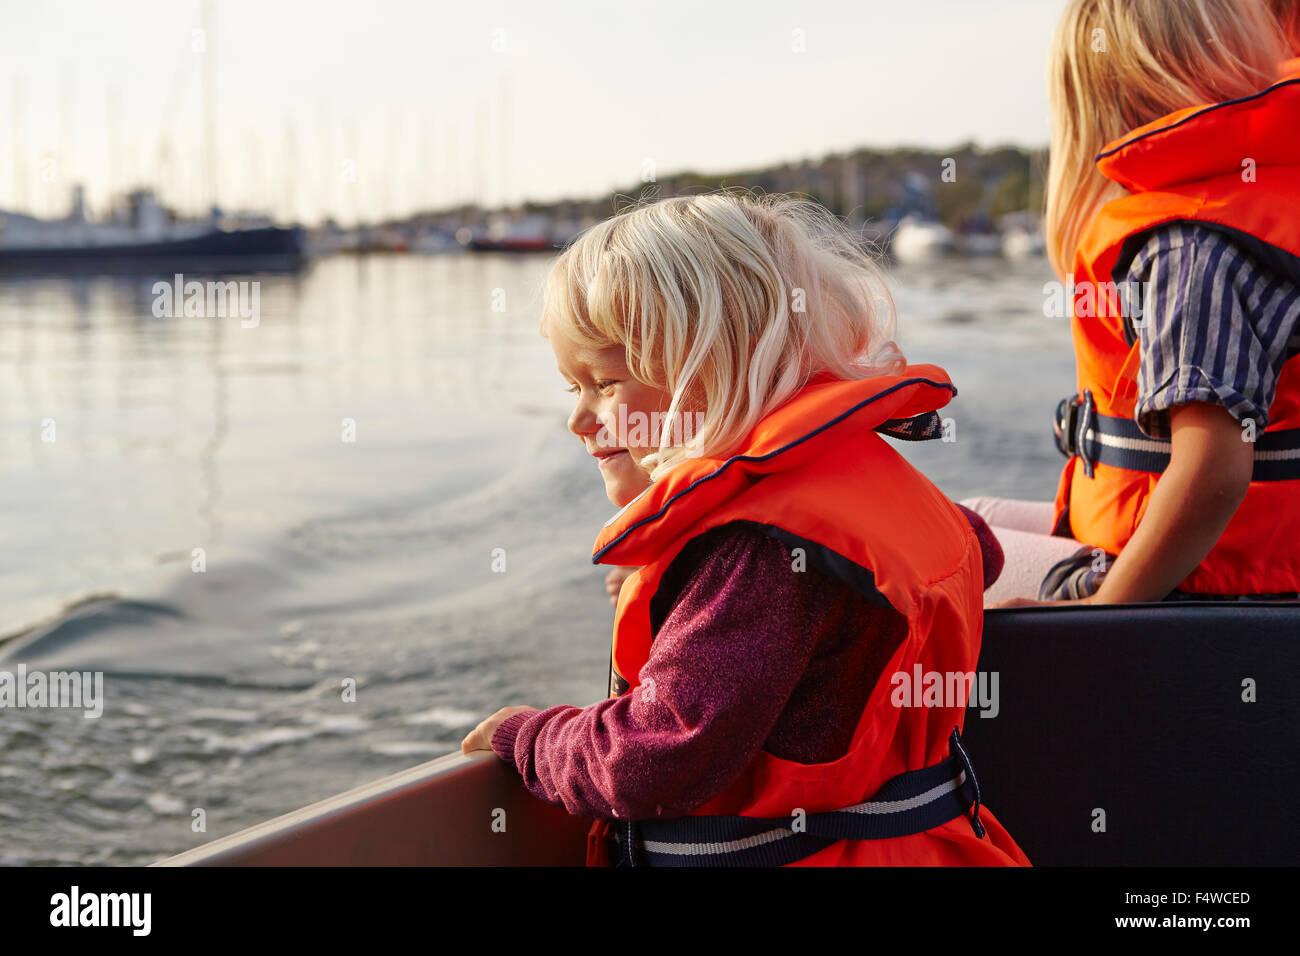 La Svezia, Svedese West Coast, Vastra Gotaland, due ragazze (4-5) sul tour in barca Immagini Stock